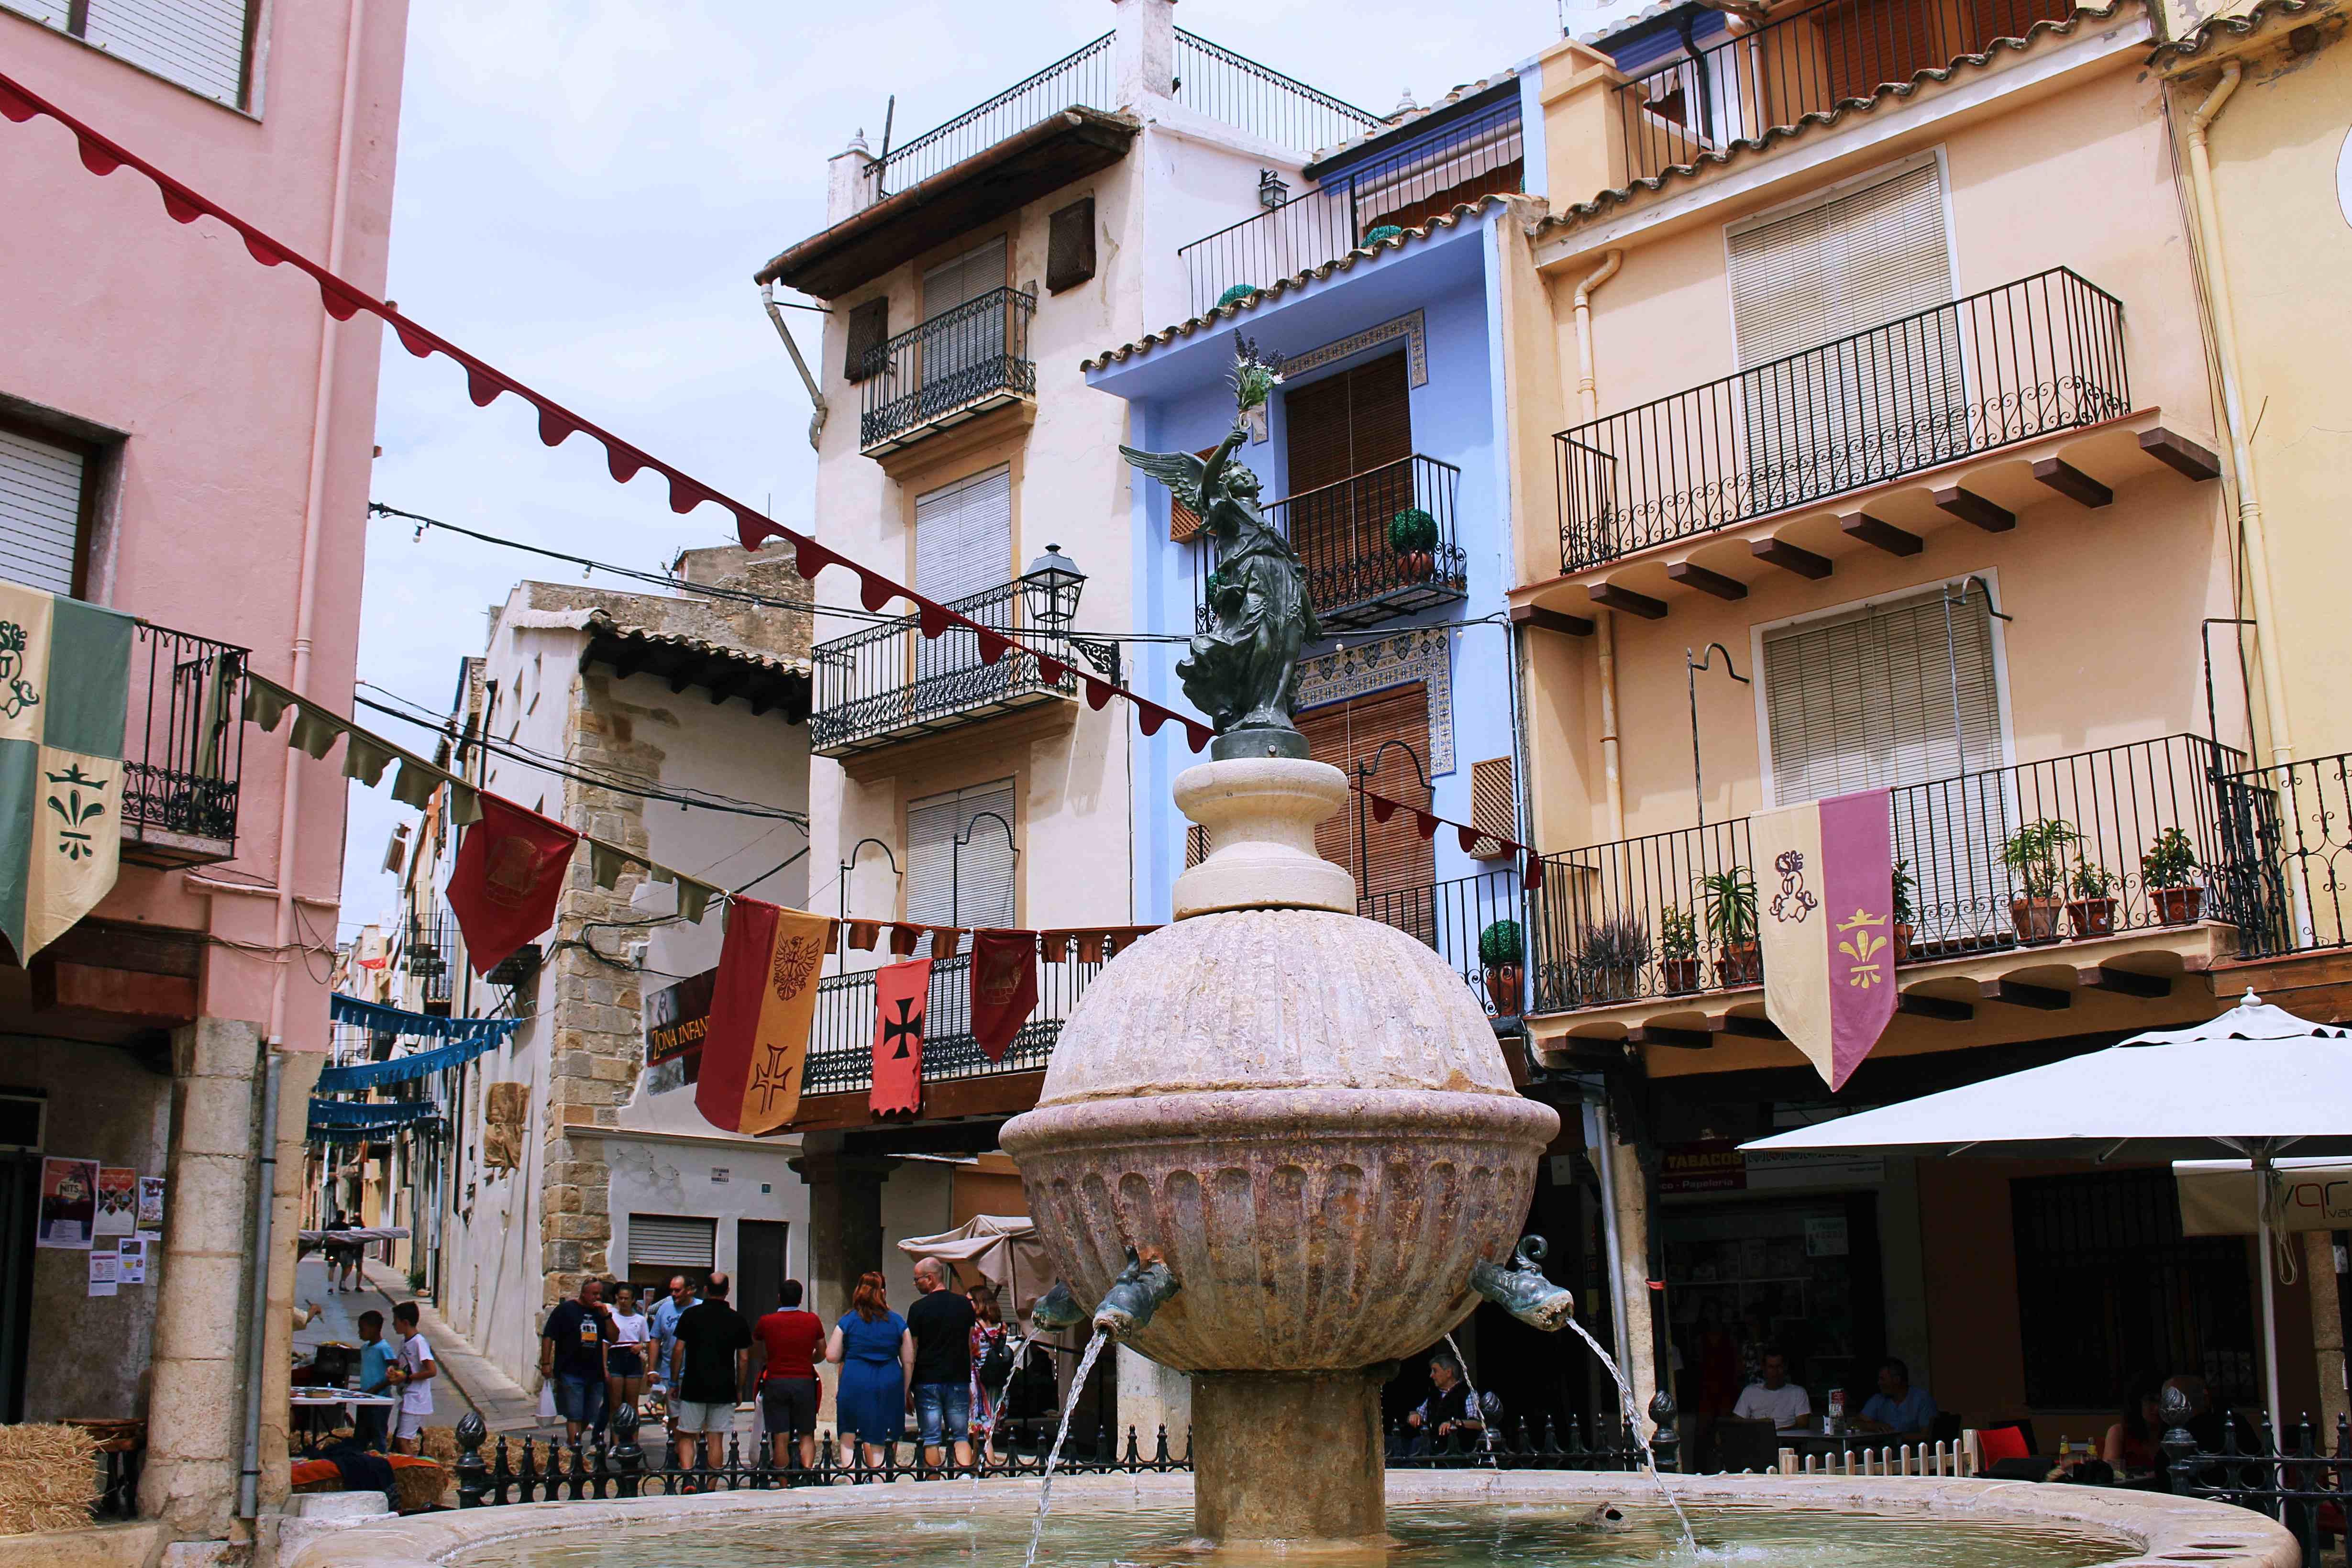 Medieval Fairs in Spain: Sant Mateu #medieval #fairs #list #spain #travel #europe #wanderlust #inspiration